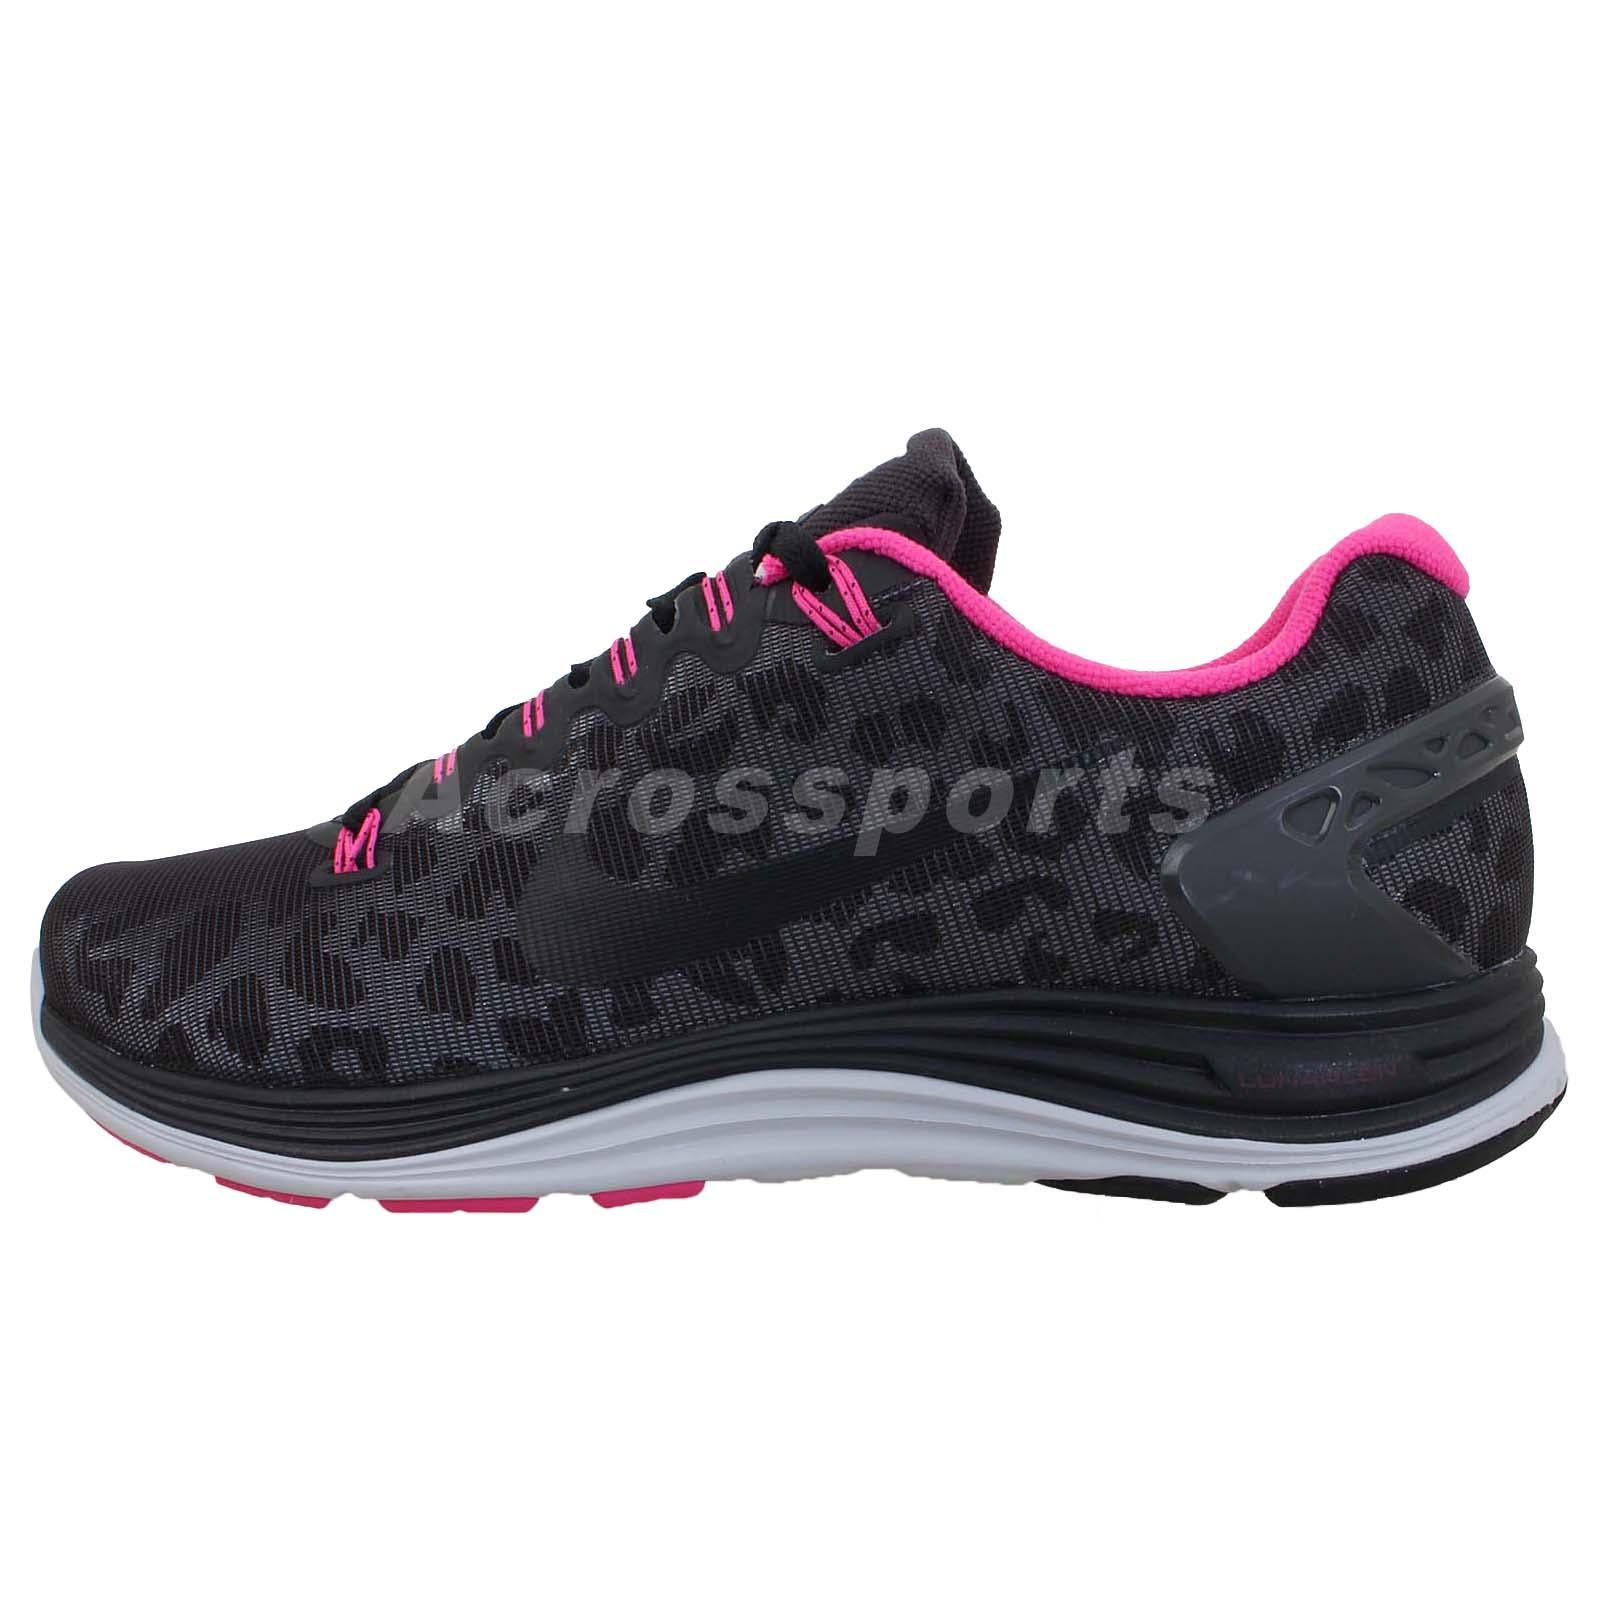 6dcb5b2b7817 Womens Nike Lunarglide 5 Leopard